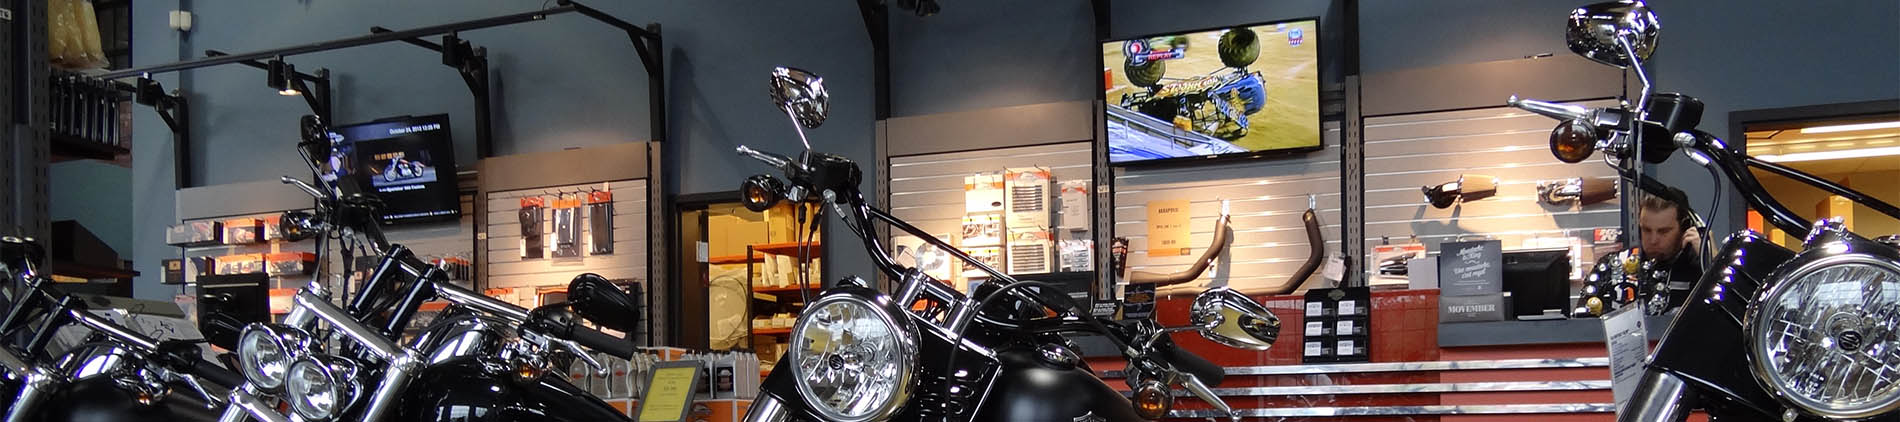 Commercial, Harley, Davidson, Display, restaurant audio video